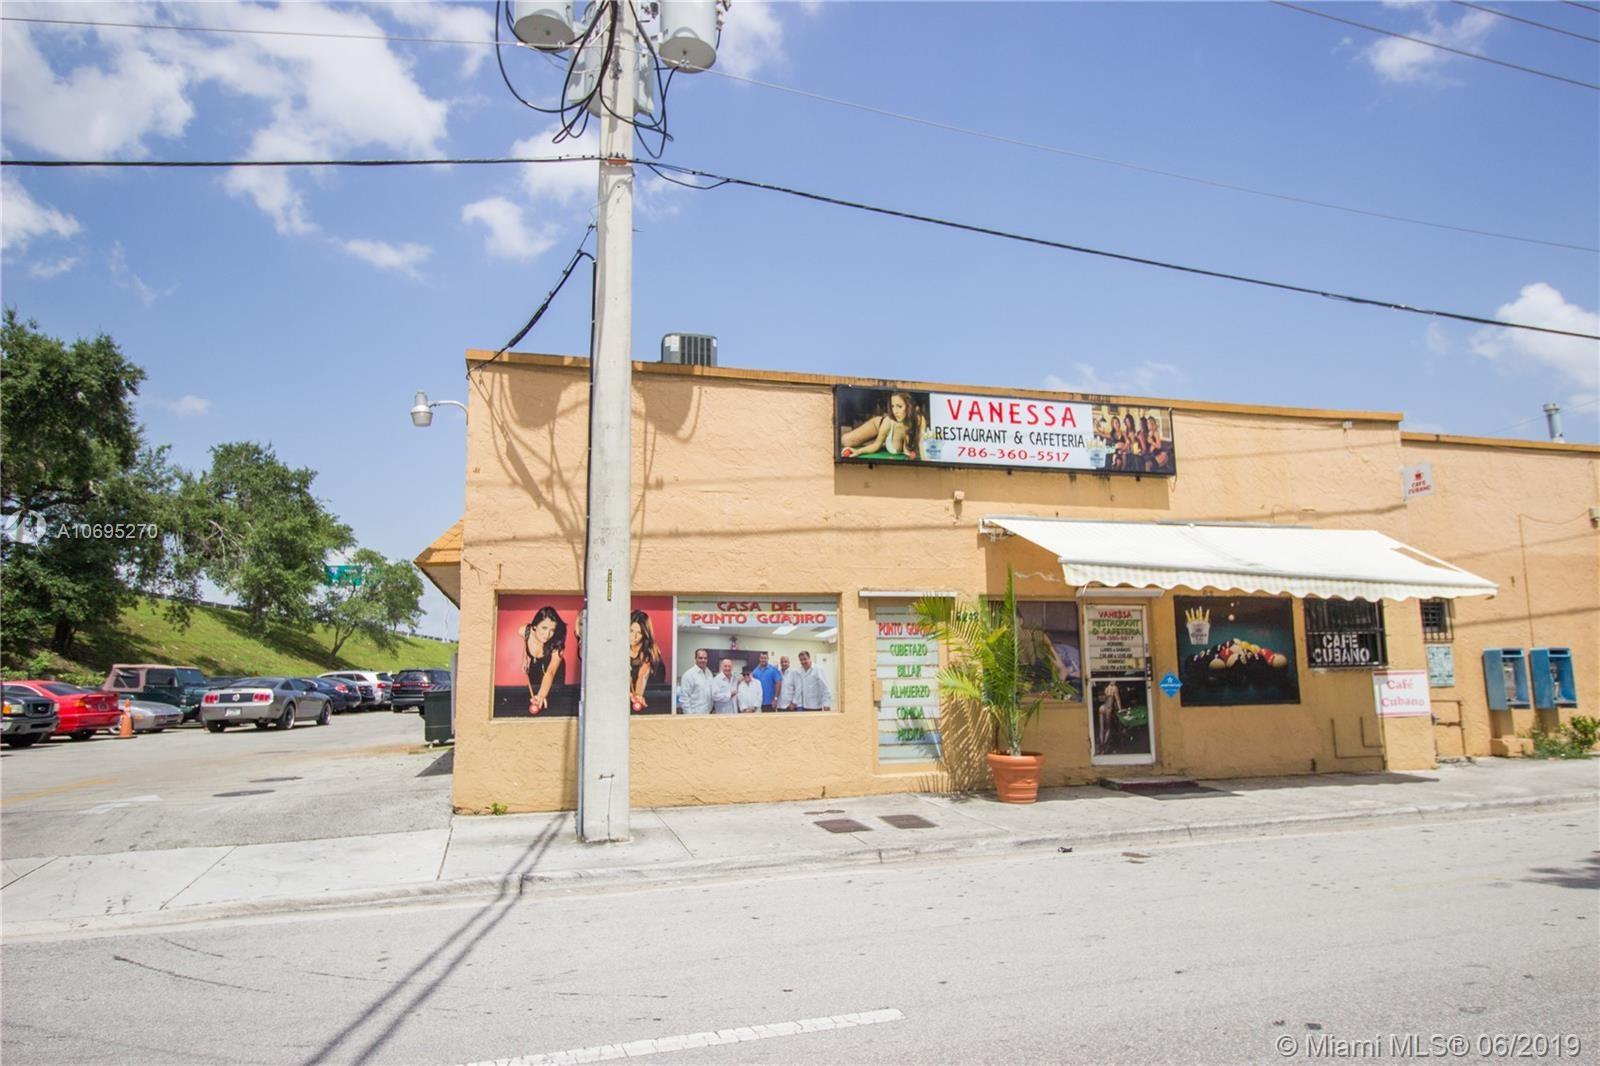 8248 W 8th Ave, Hialeah, FL 33014